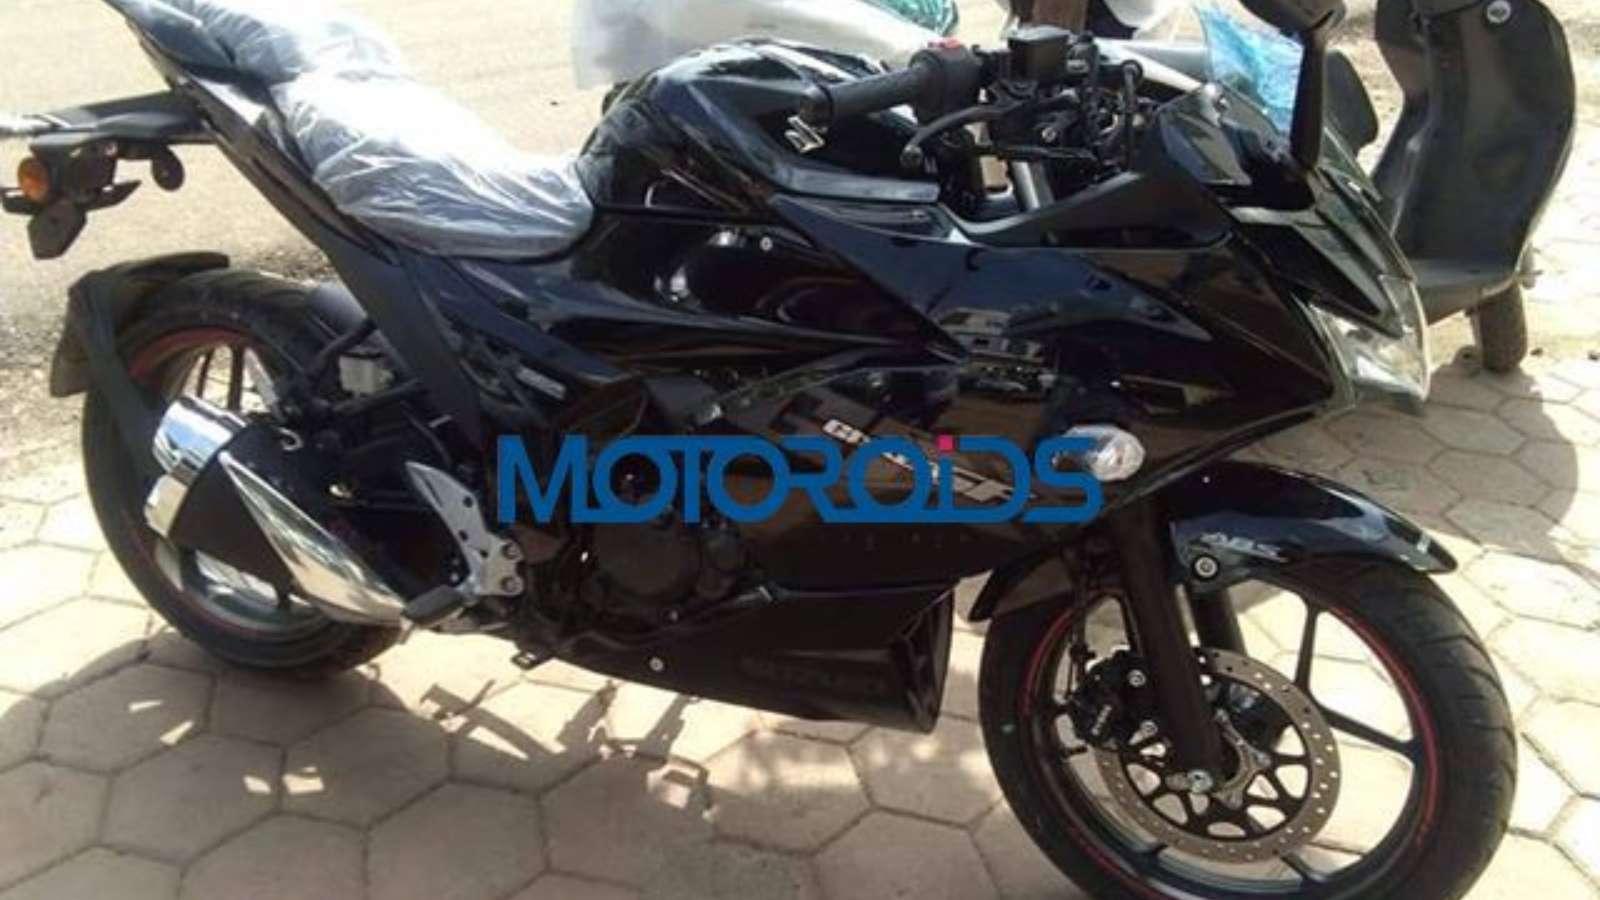 SCOOP 2019 Suzuki Gixxer SF 150 Images Leaked Motoroids 1600x900